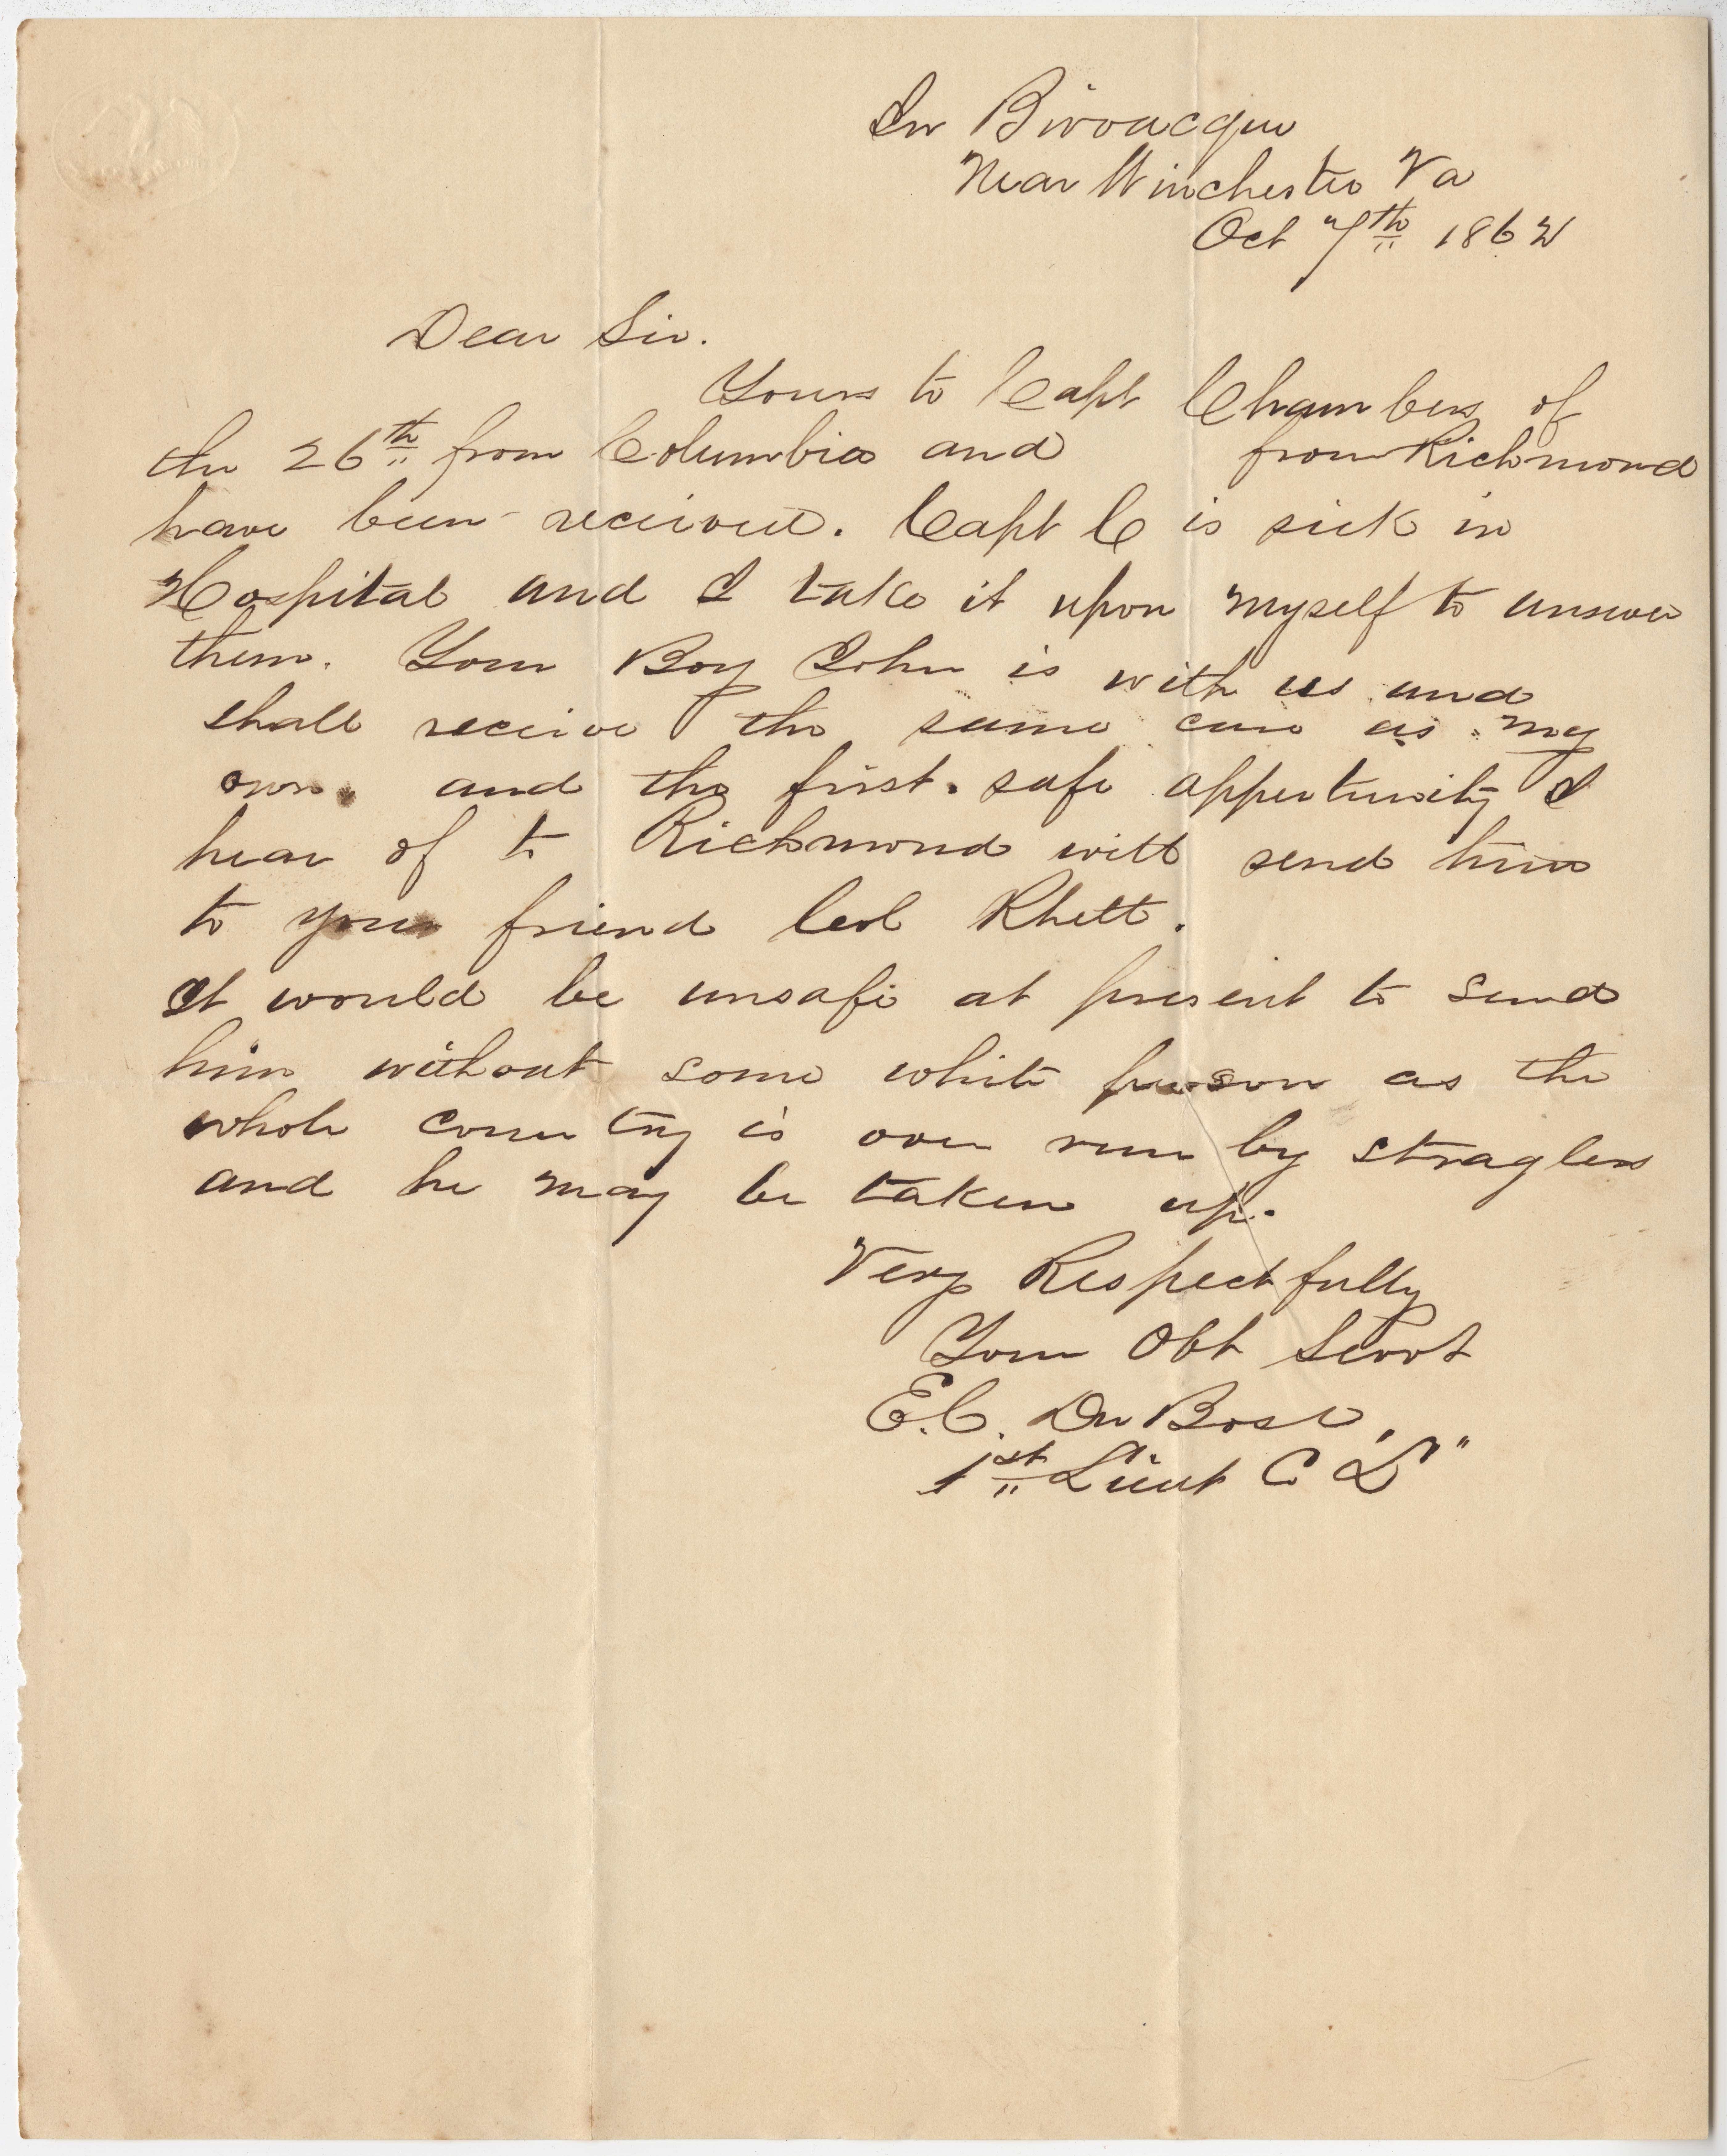 180. E.C. DuBose to James B. Heyward -- October 7, 1862